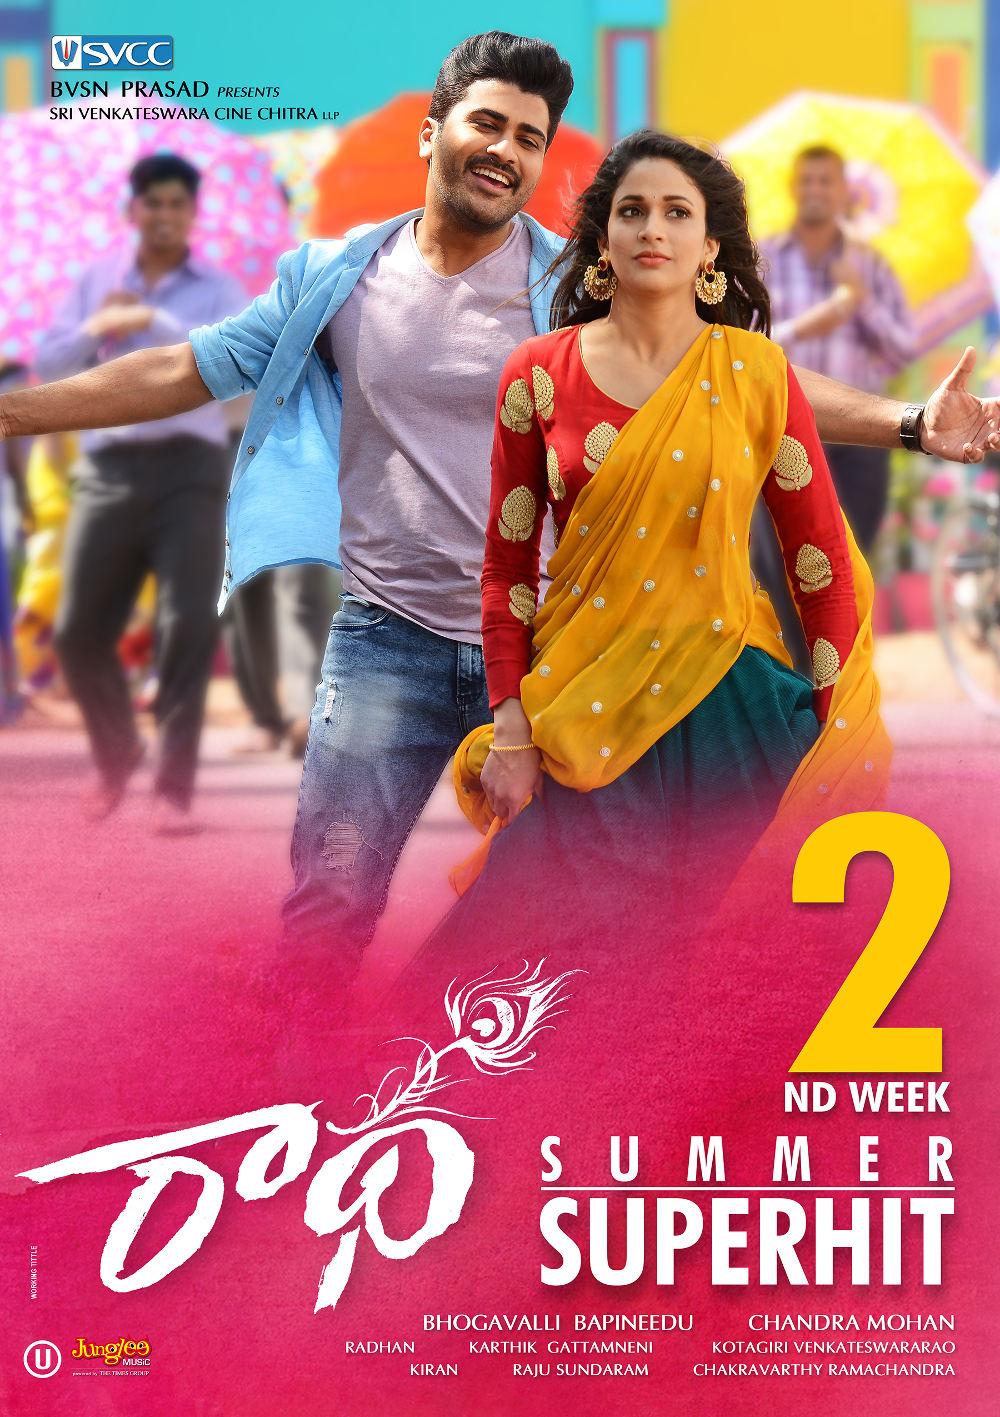 Sharwanand, Lavanya Tripathi in Radha Movie 2nd week Posters